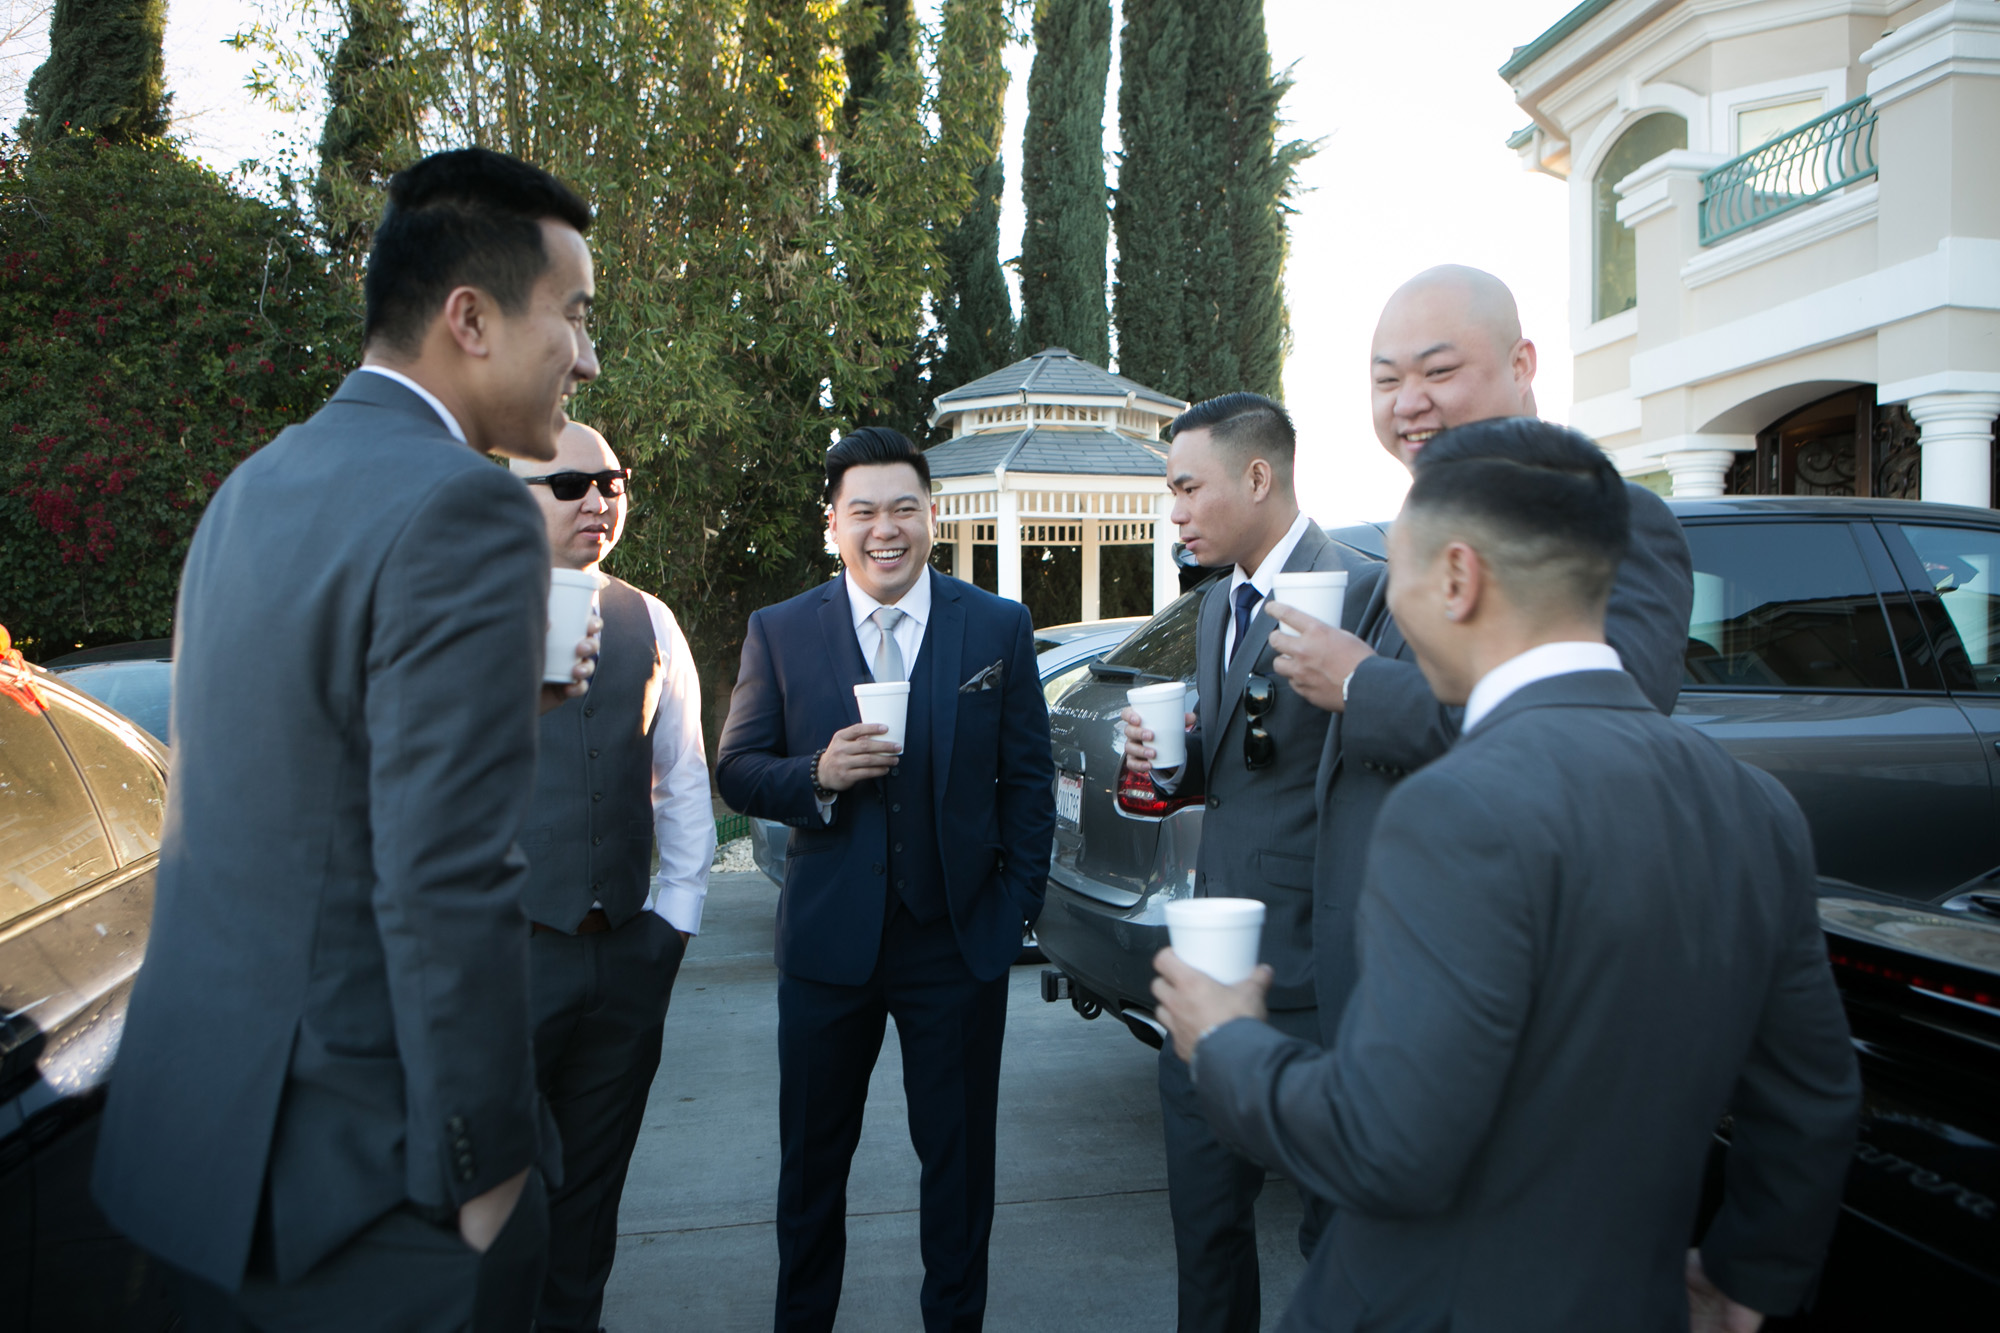 Geoff Kowalchuk JT Wedding Photo-002.jpg